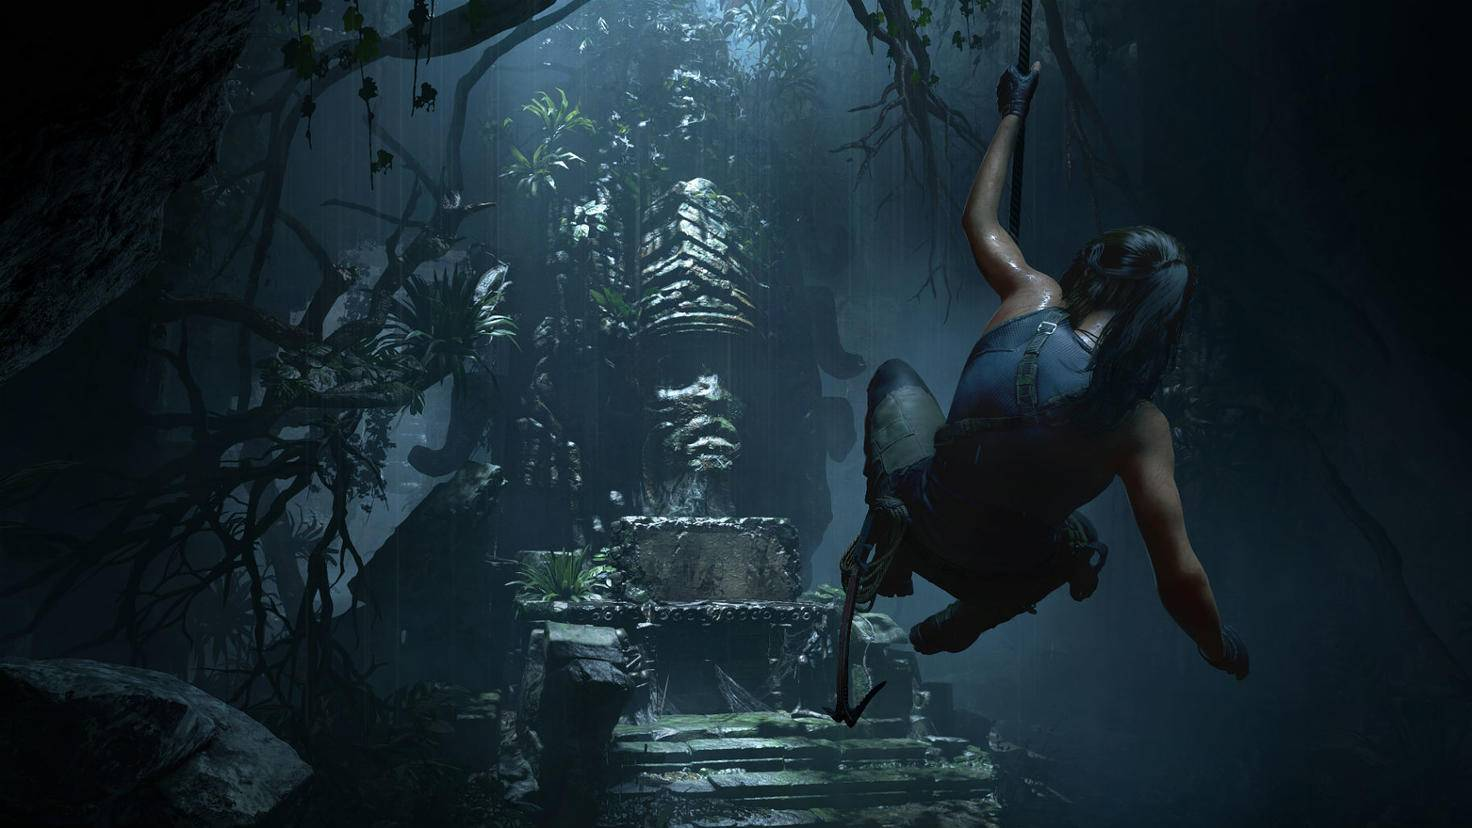 shadow-of-the-tomb-raider-screenshot-03